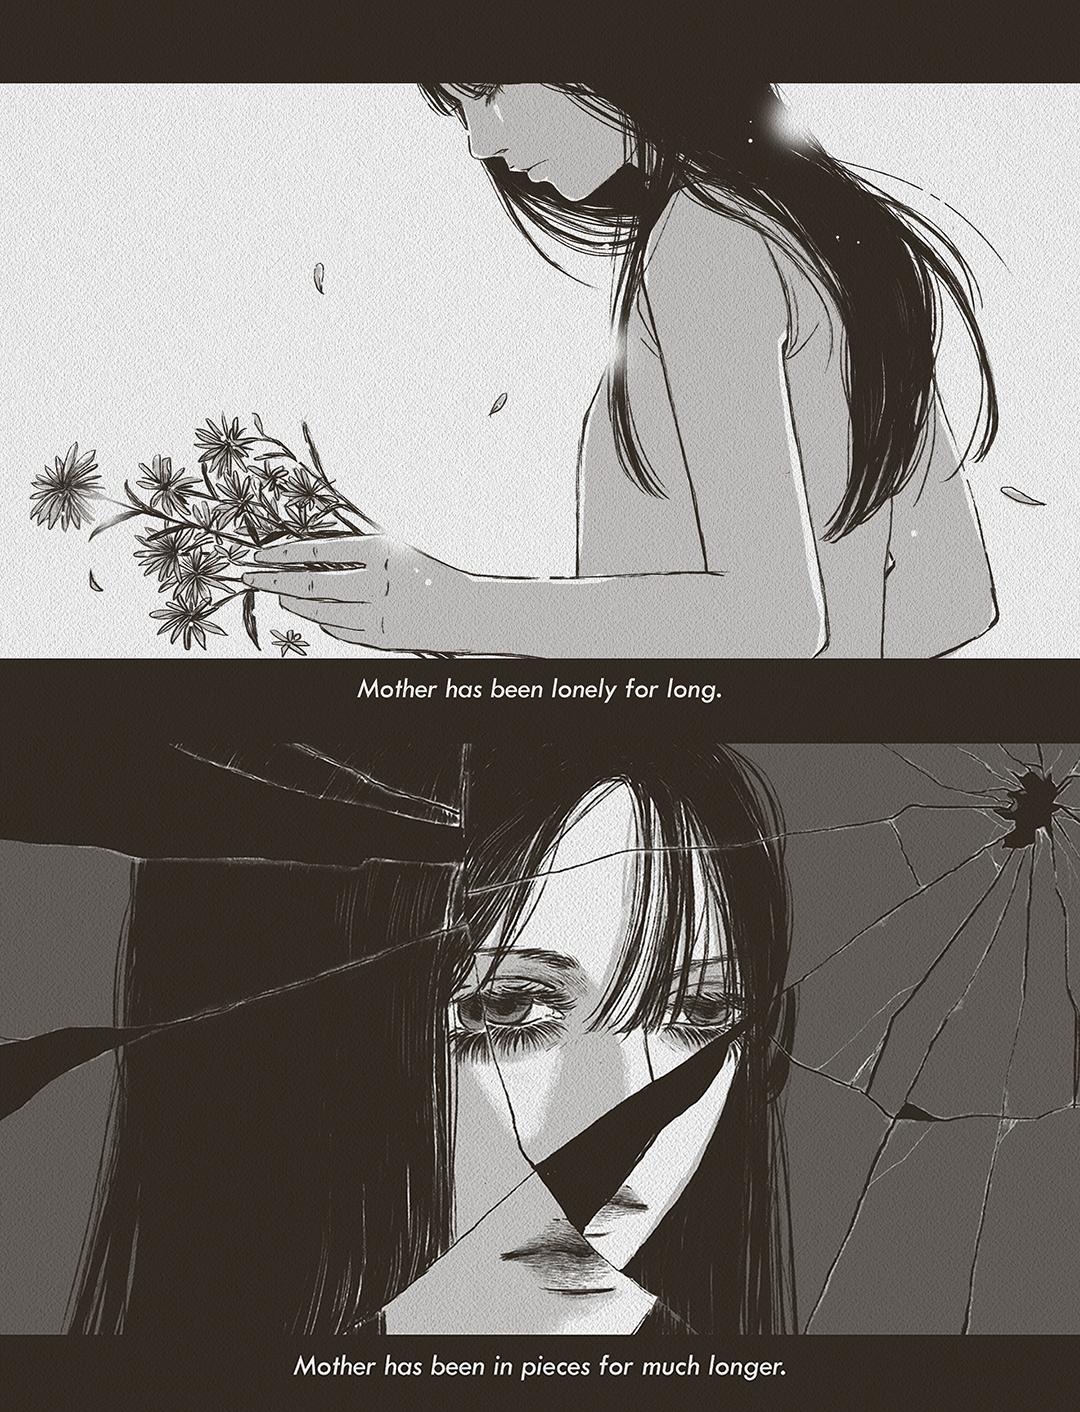 GirlsclubAsia-Illustrator-Anwita Citriya-12